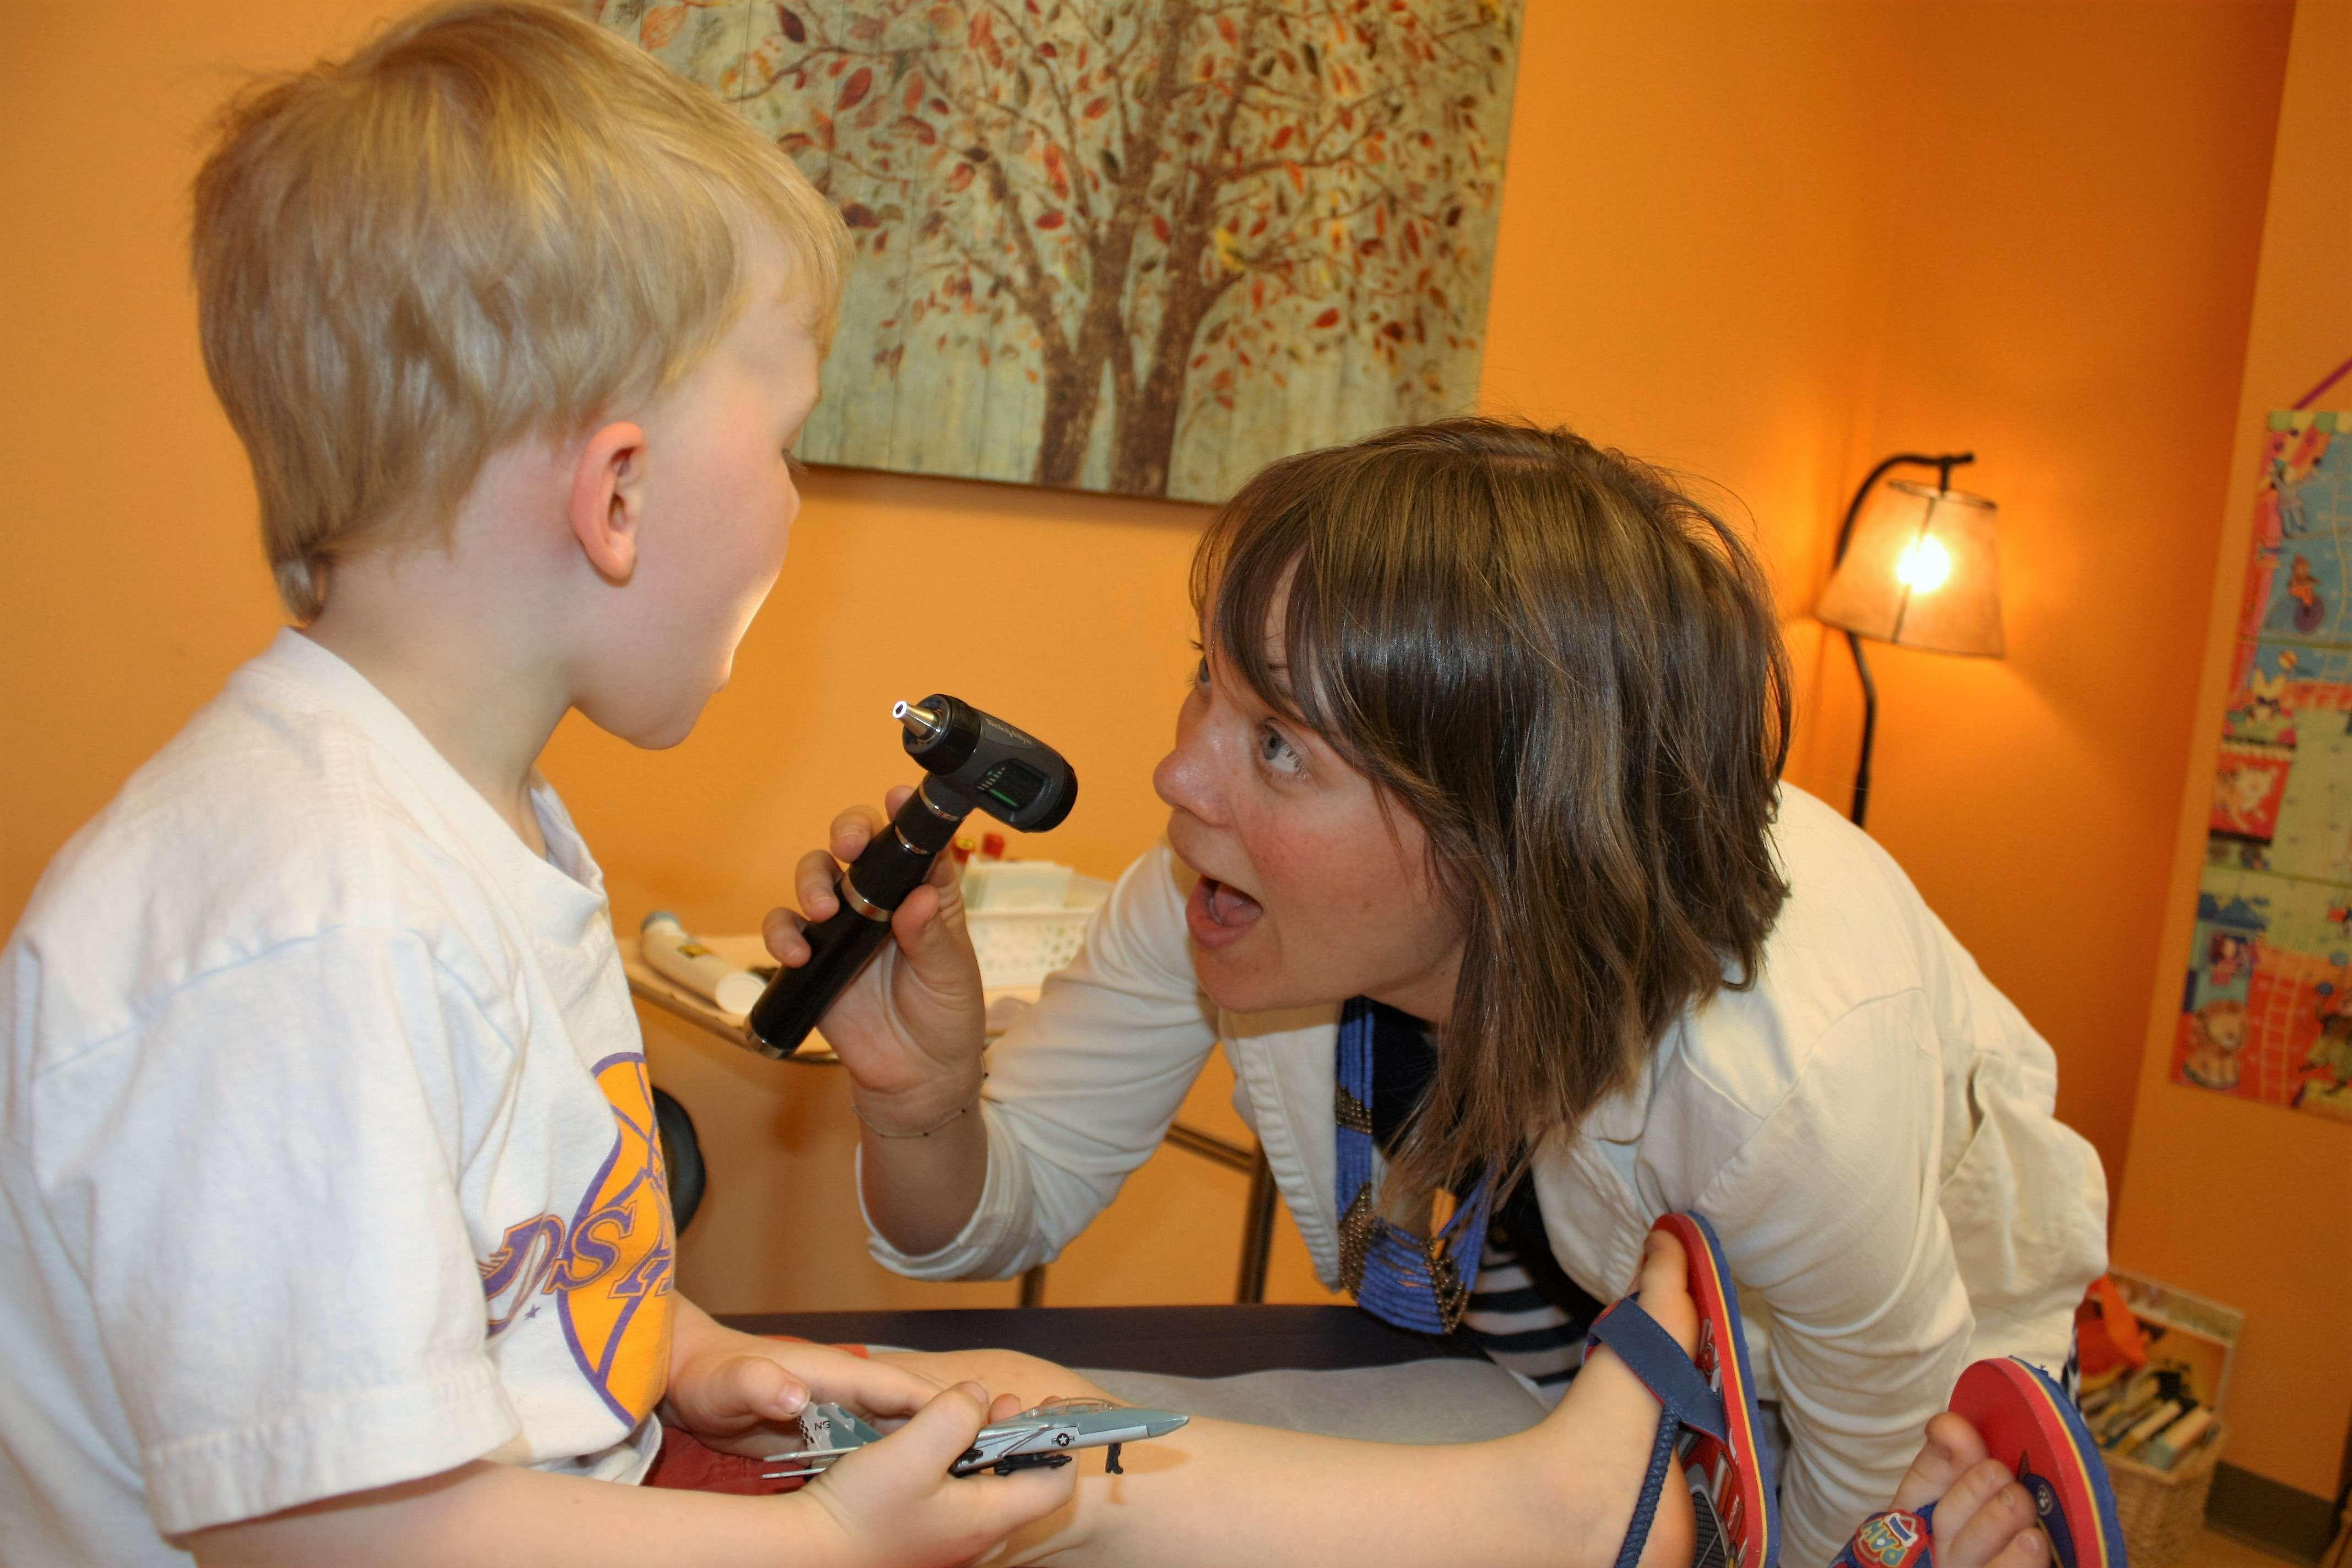 Dr. Norris with pediatric patient